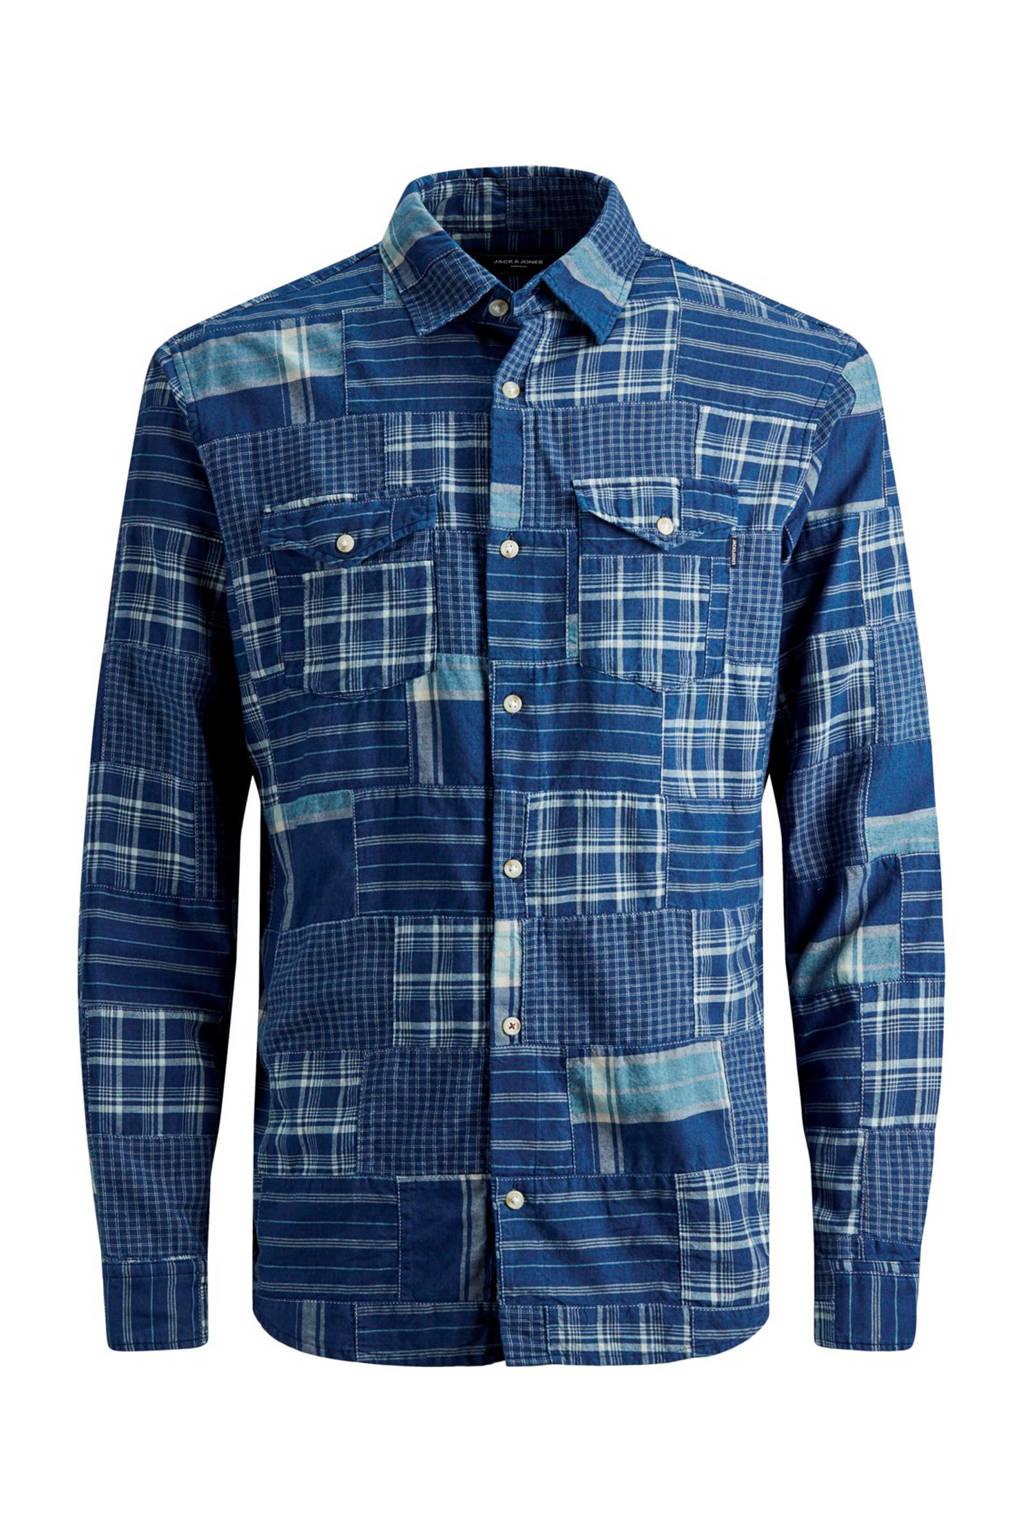 JACK & JONES PREMIUM geruit regular fit overhemd blauw, Blauw